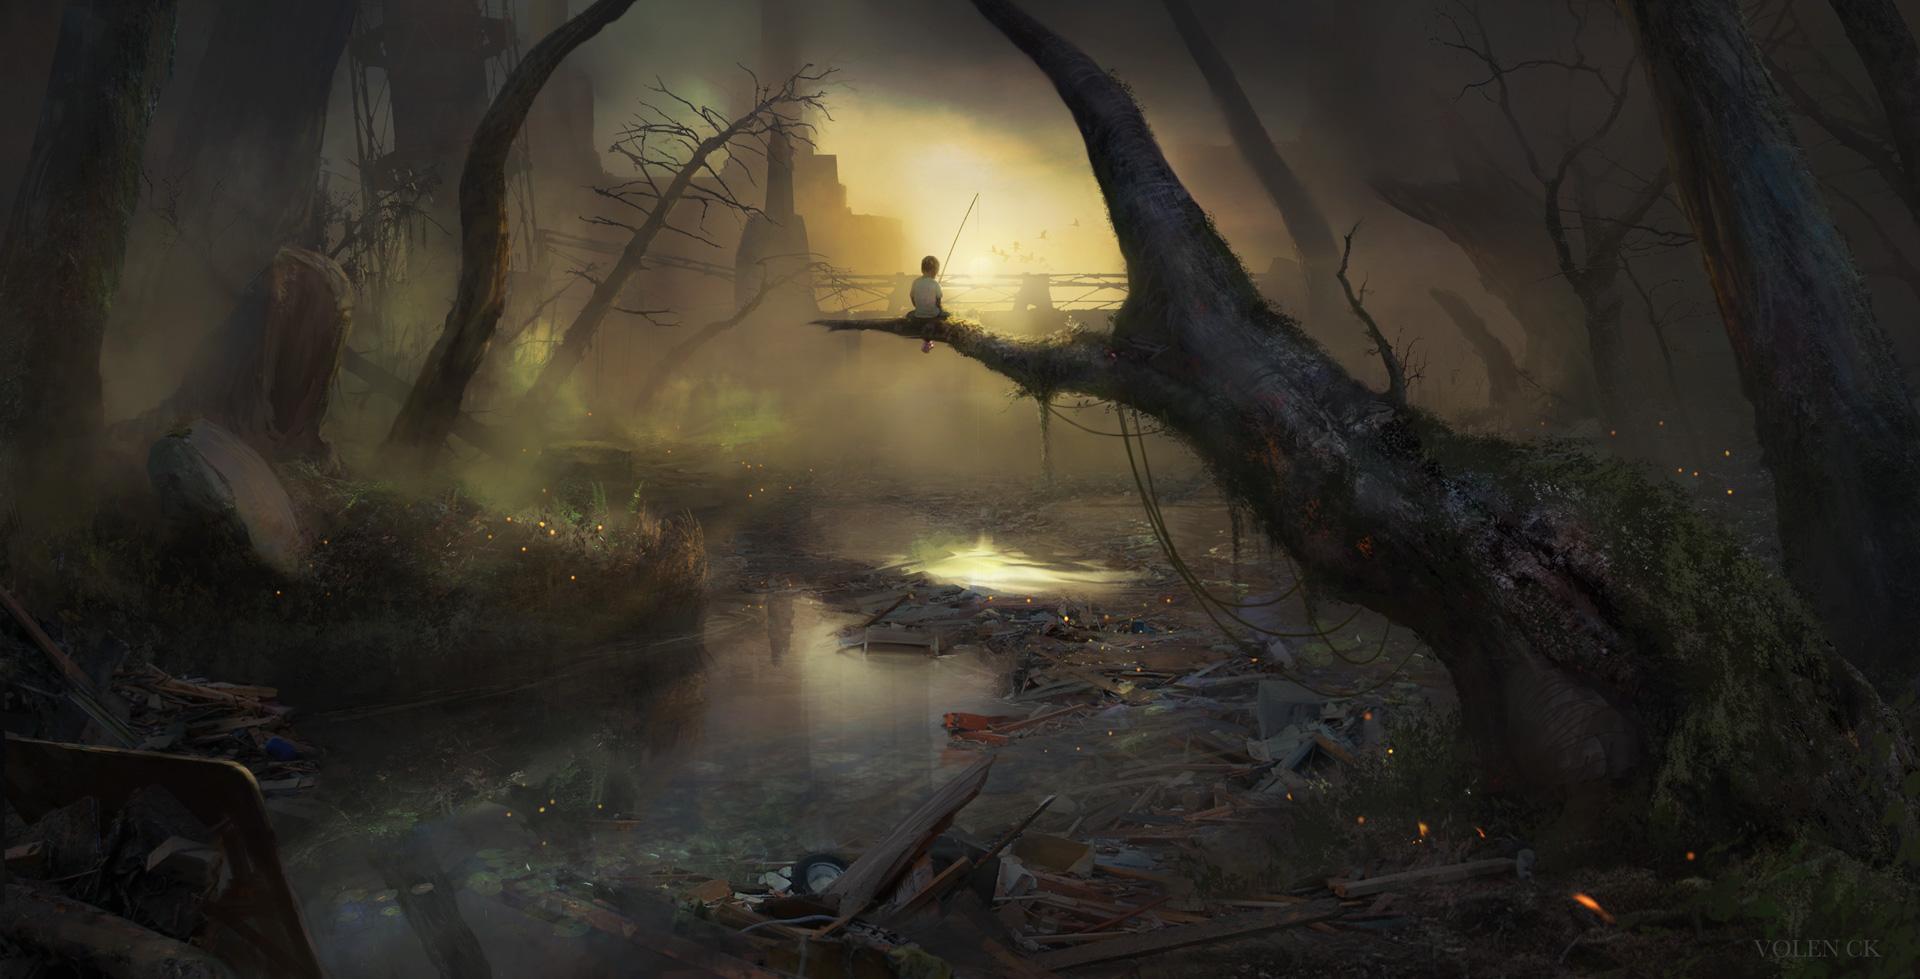 The-Toxic-River---Volen-CK---Concept-Art---Illustration---Design